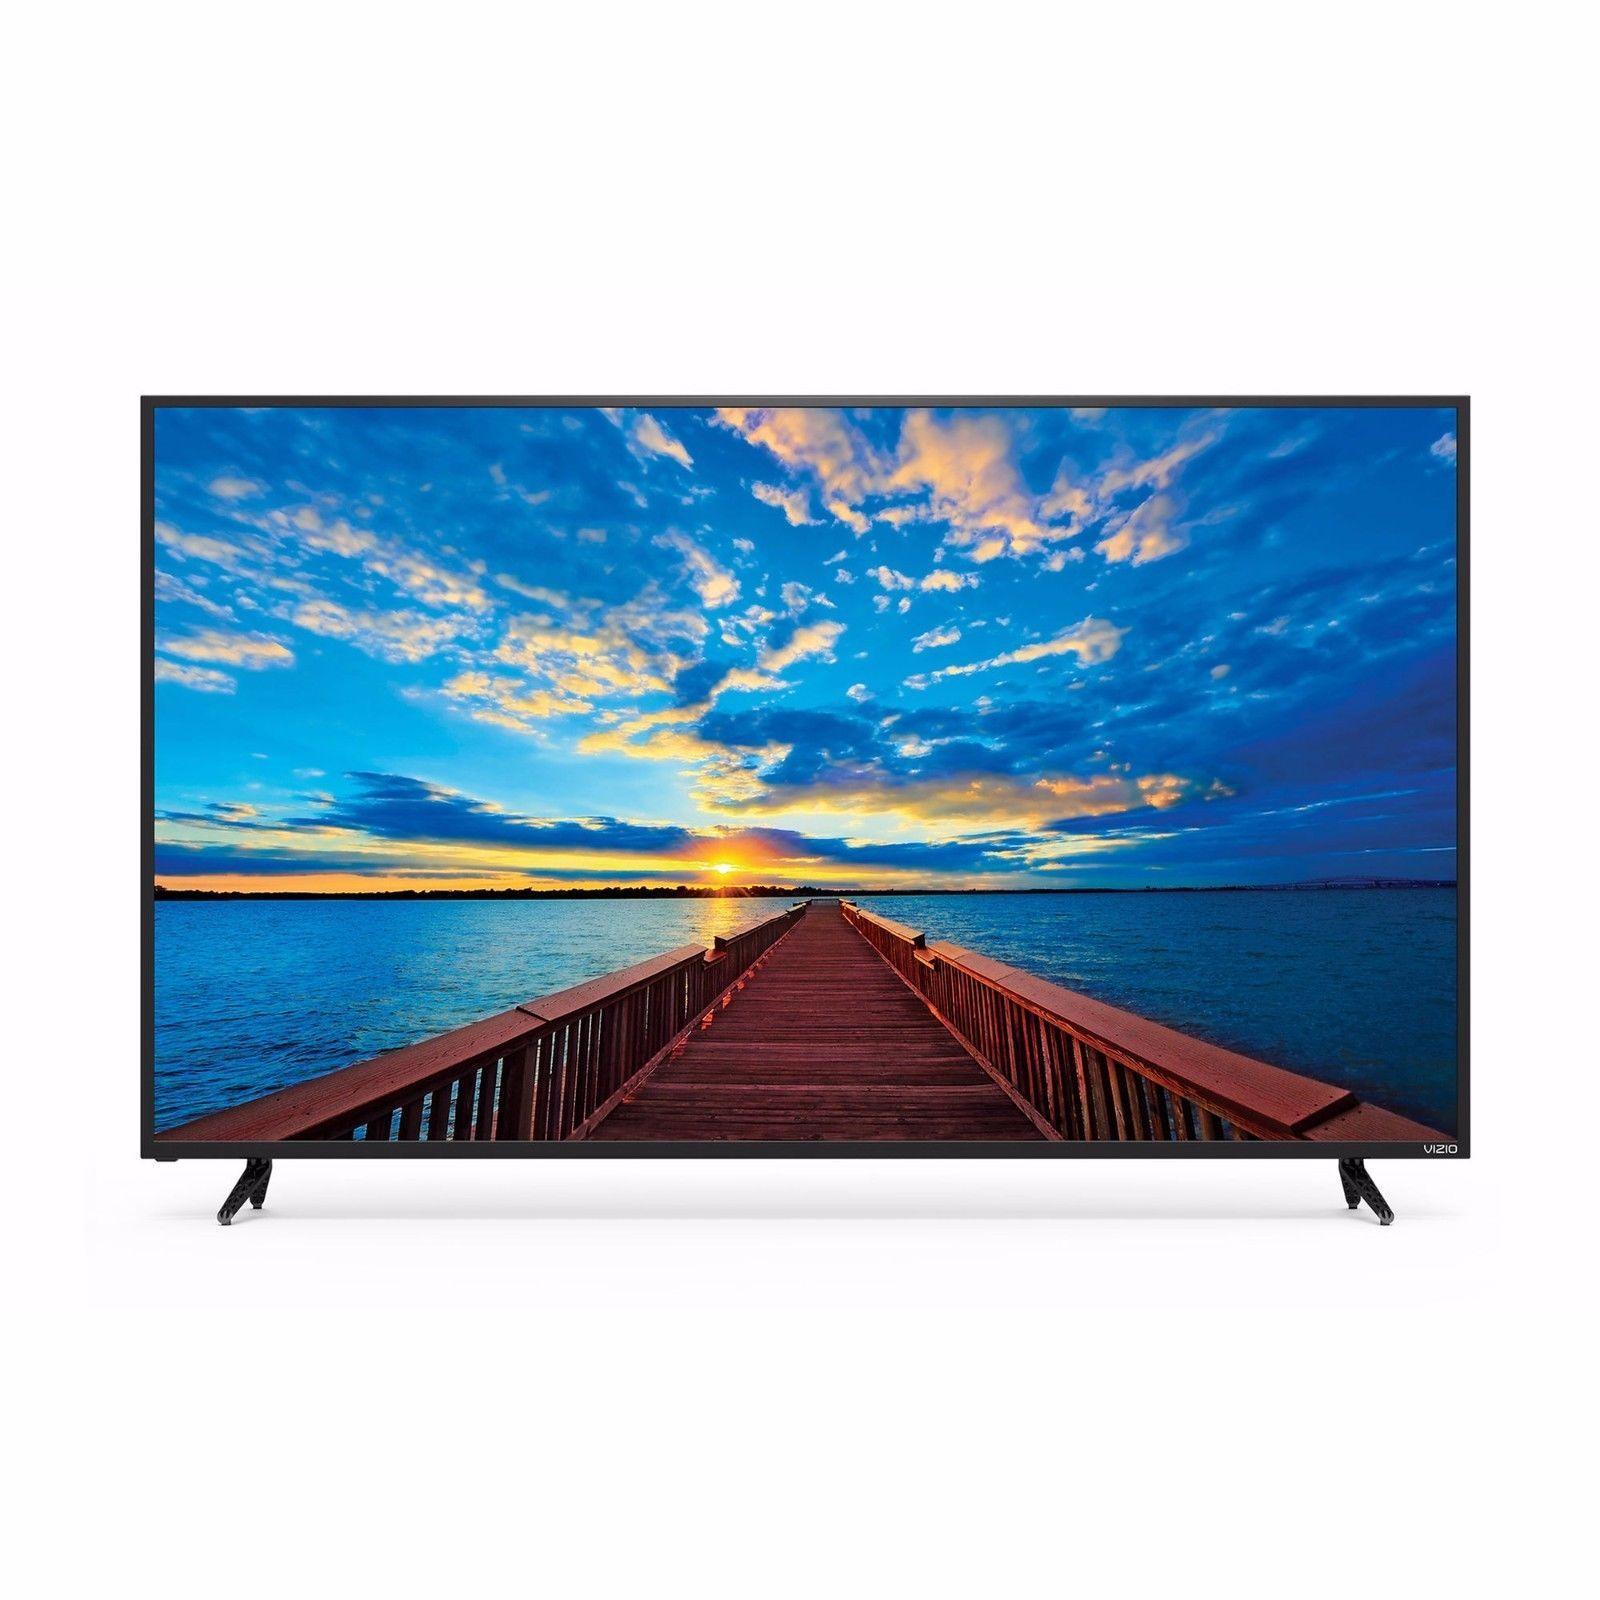 Vizio E43 E2 43 034 Class 4k 2160p Smart Full Array Led Tv With 3 Hdmi And 1 Usb 4k Uhd Smart Tv Televisor